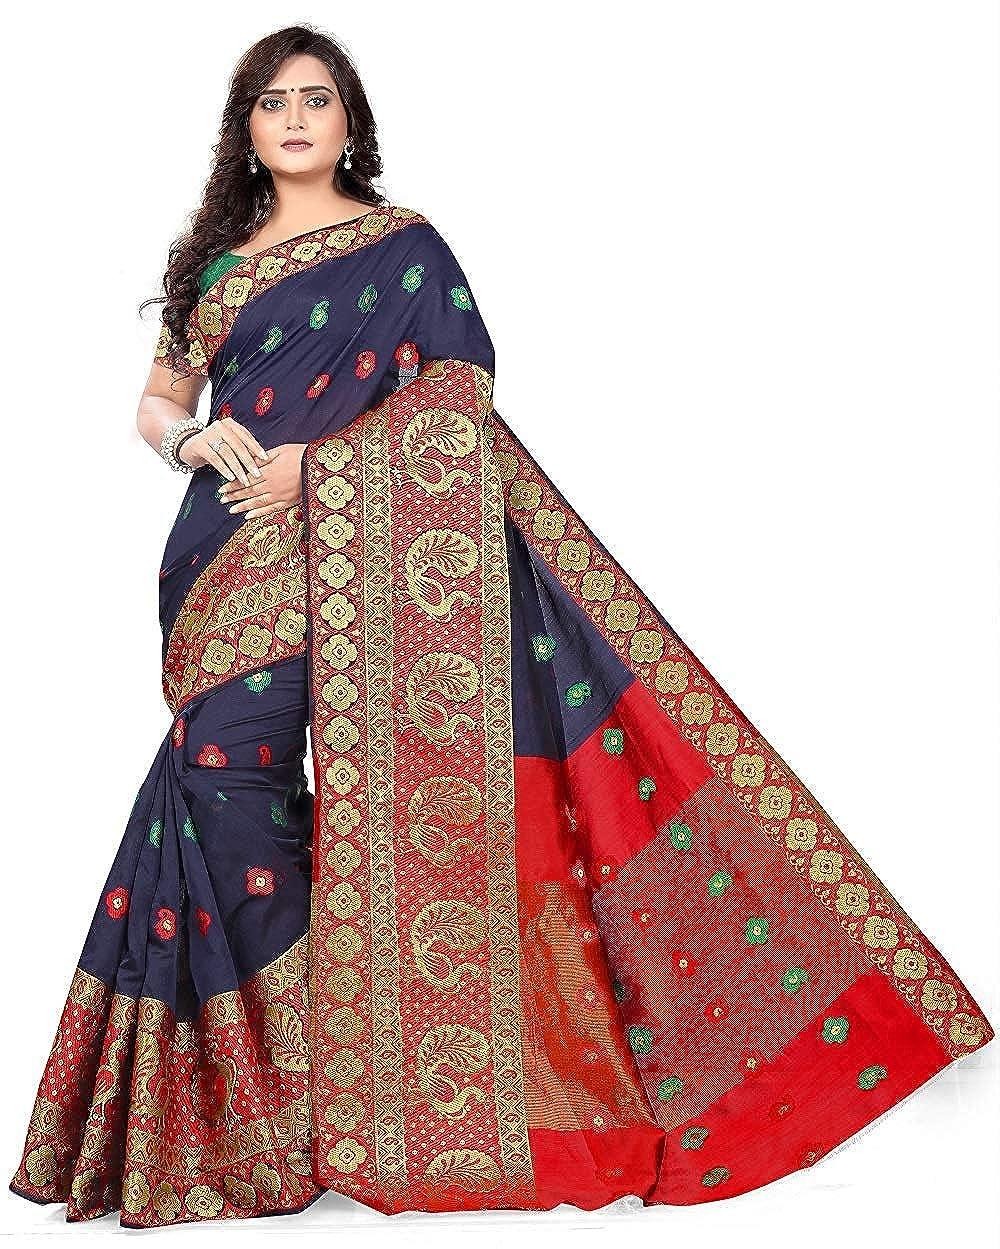 68bc4d6aa3 Sandar Fab Woven Banarasi Multicolor Cotton, Banarasi Silk, Tussar Silk  Saree (Multicolor) (blue): Amazon.in: Clothing & Accessories